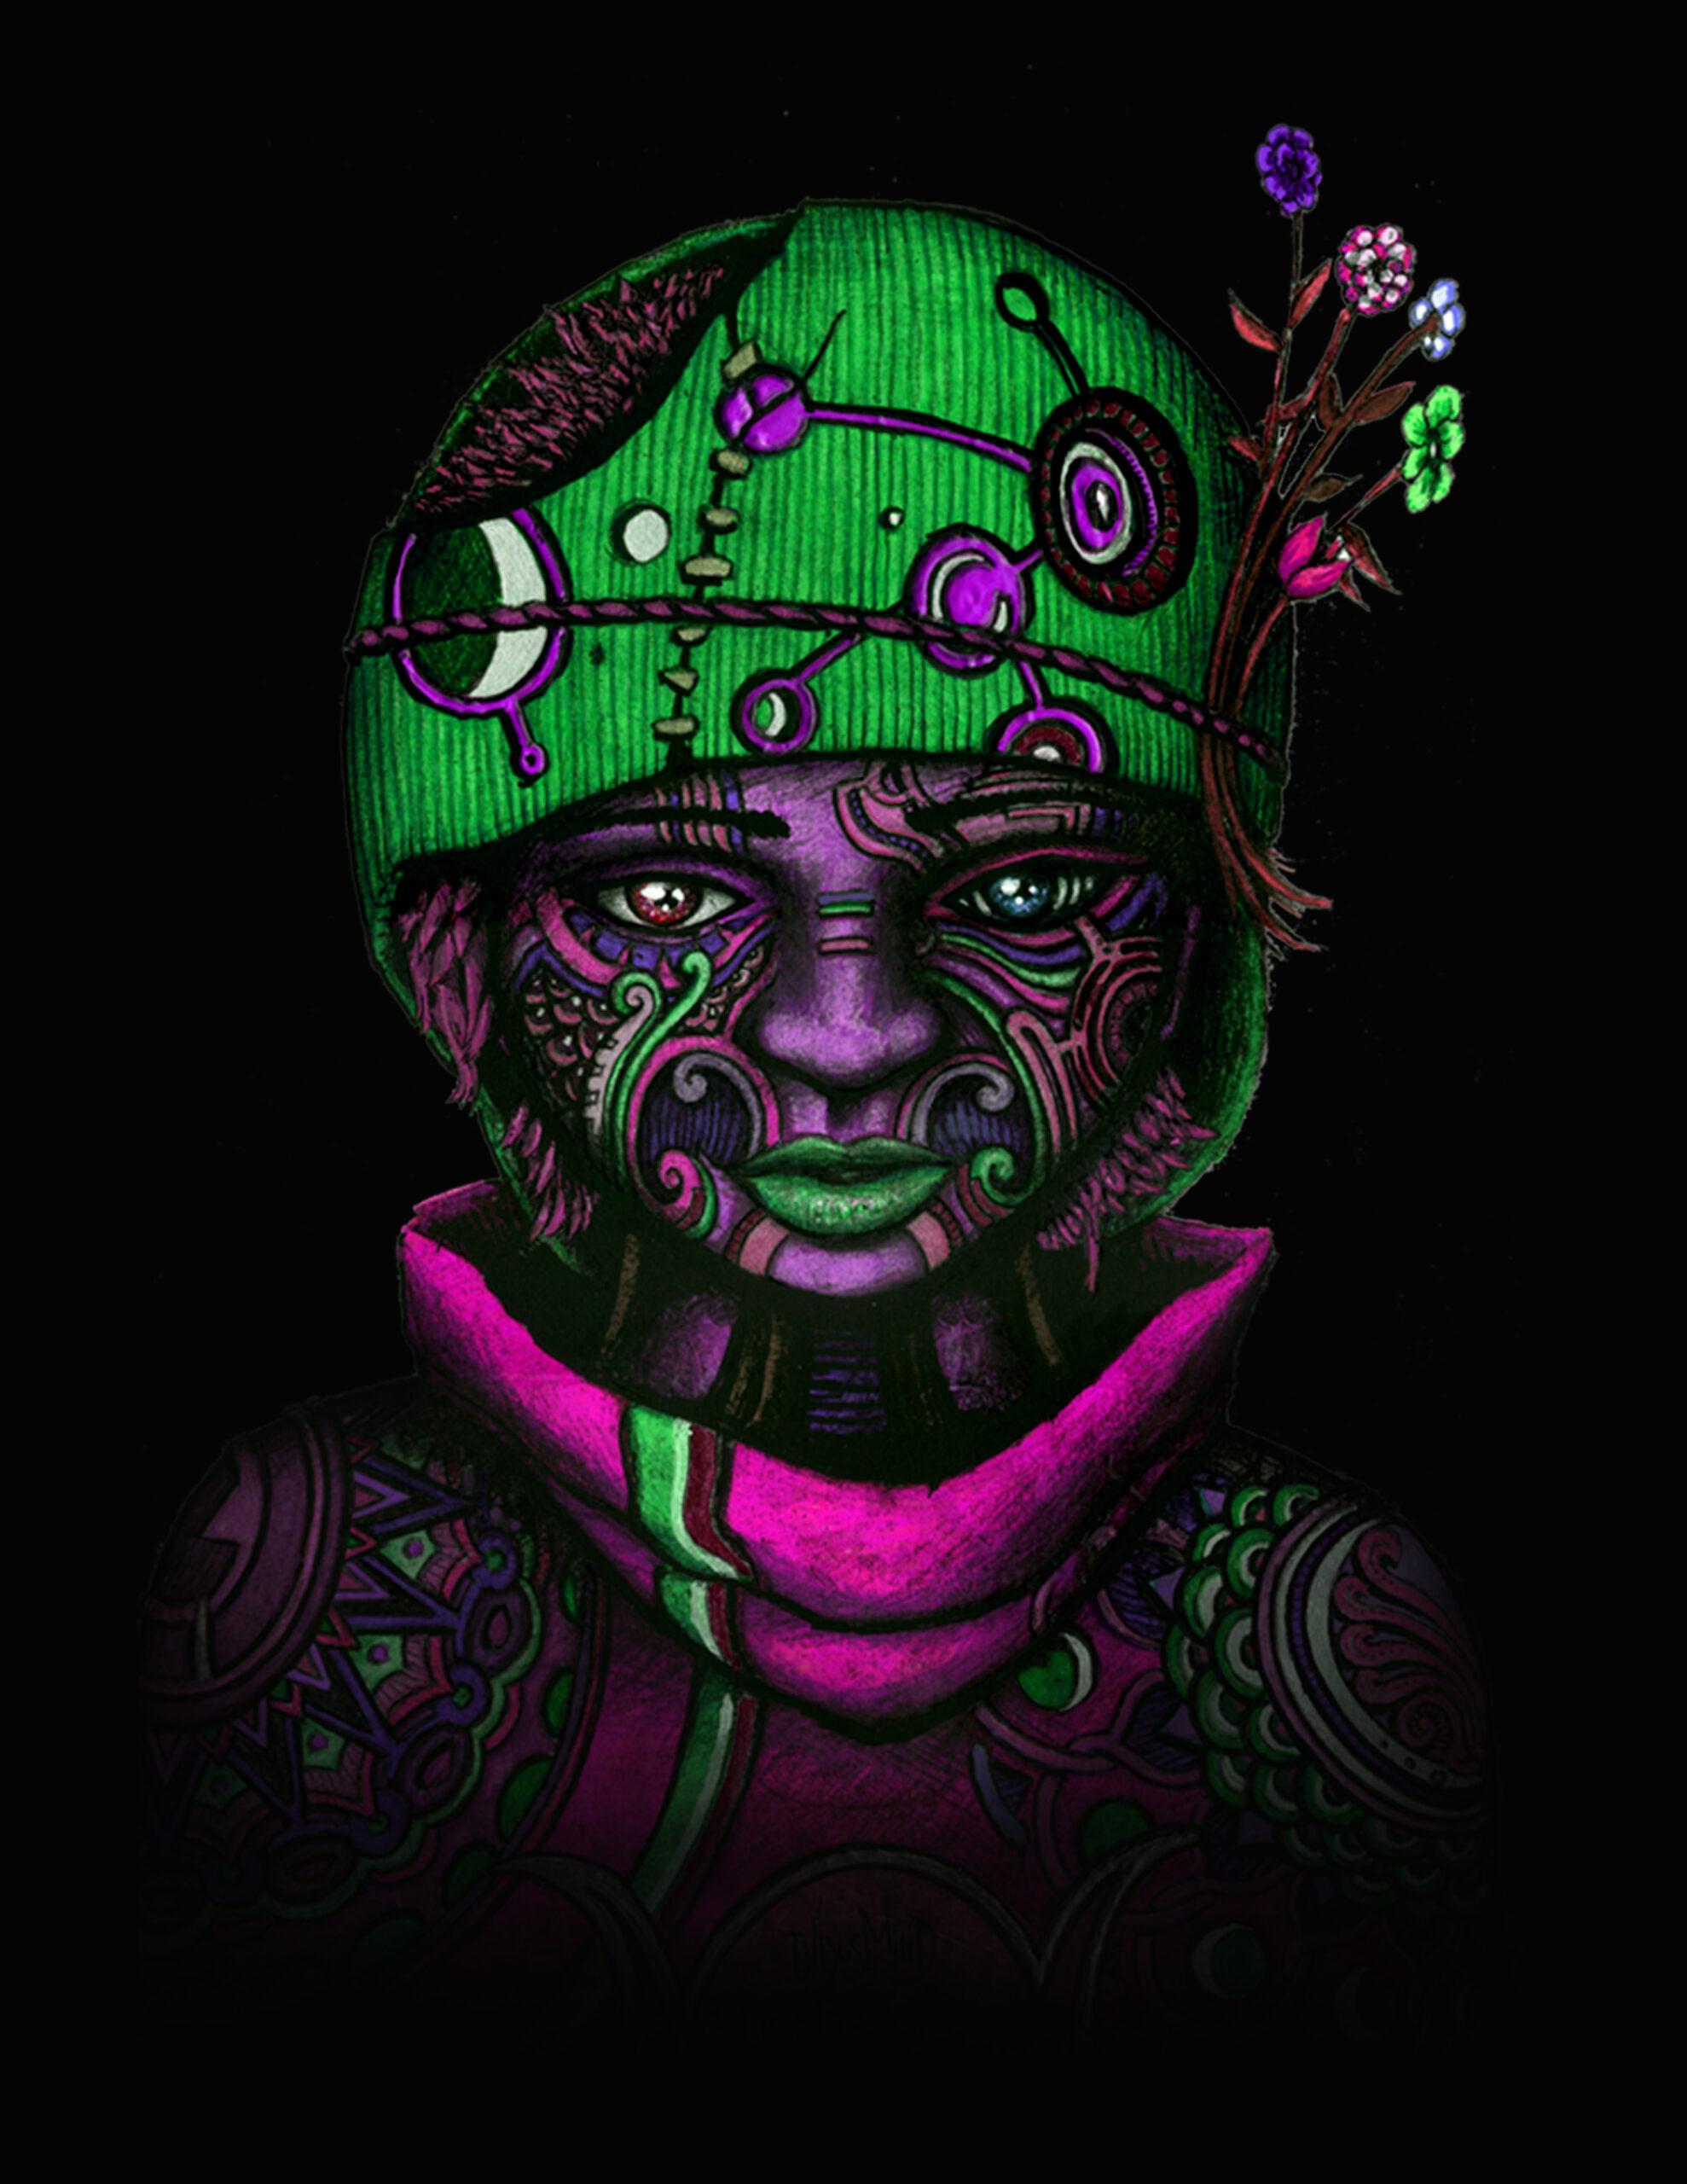 The awakening (3/9) by INDUSMiND